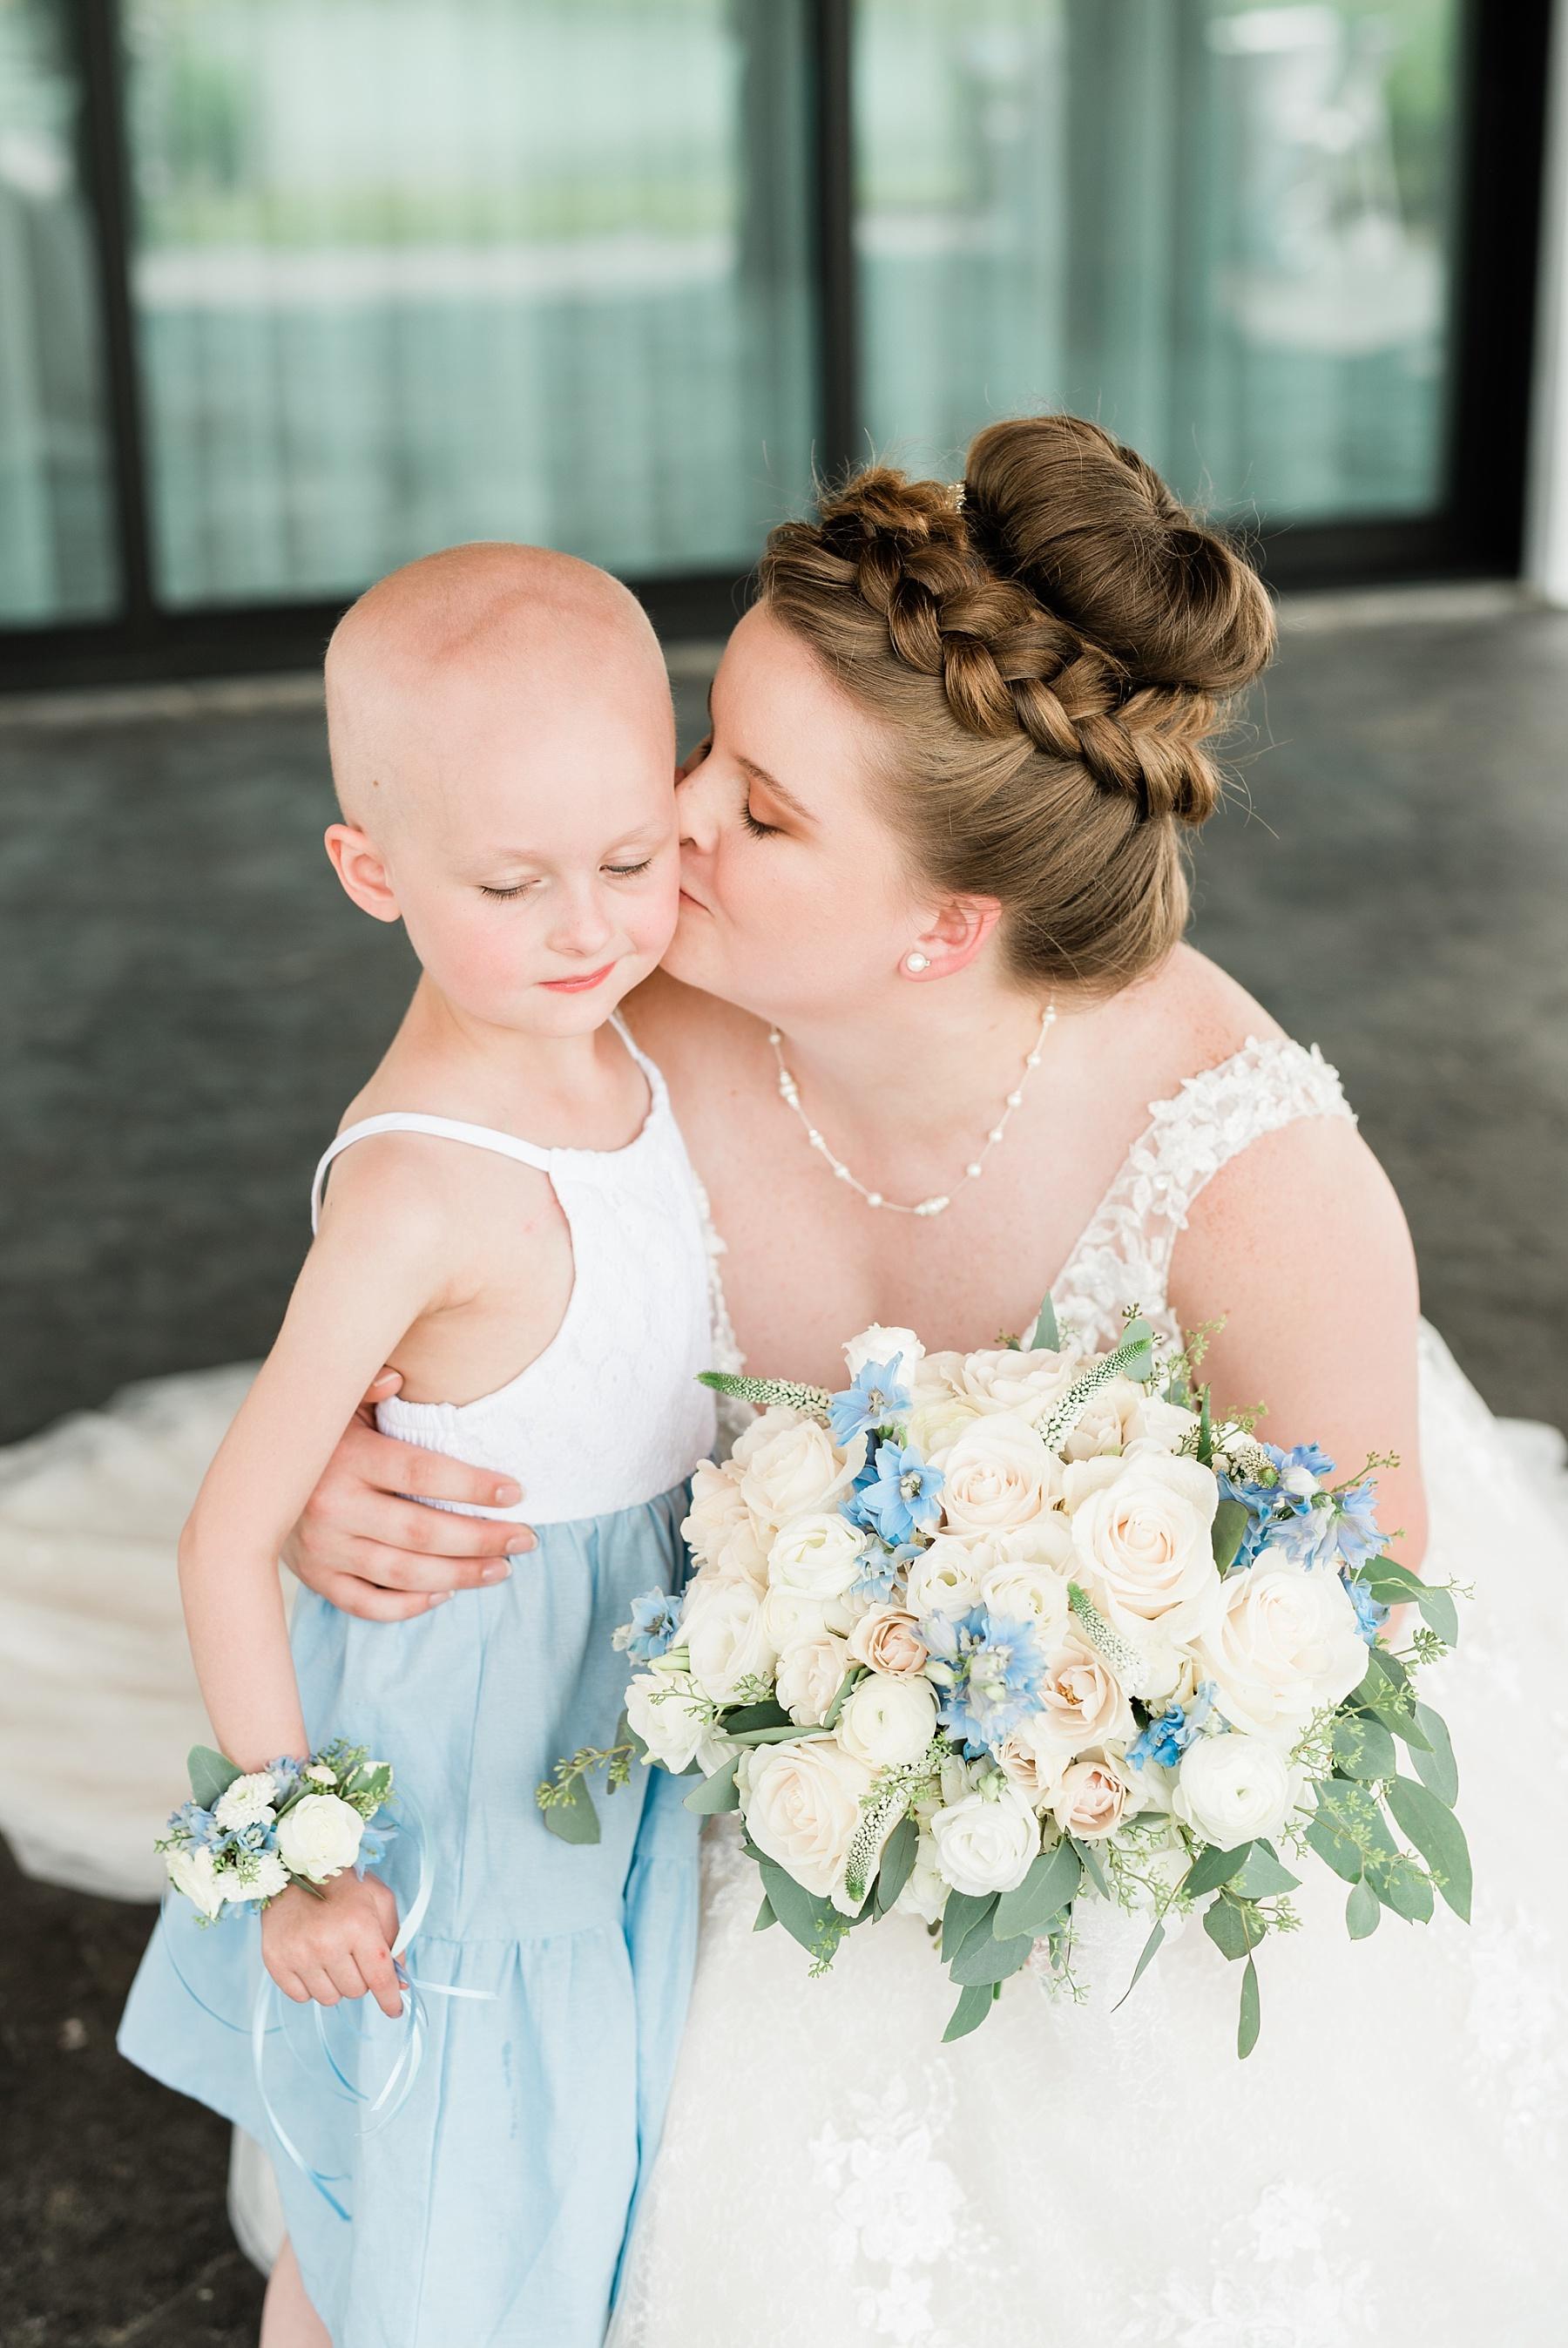 Intimate Summer Wedding at Emerson Fields by Kelsi Kliethermes Photography Best Missouri and Maui Wedding Photographer_0047.jpg